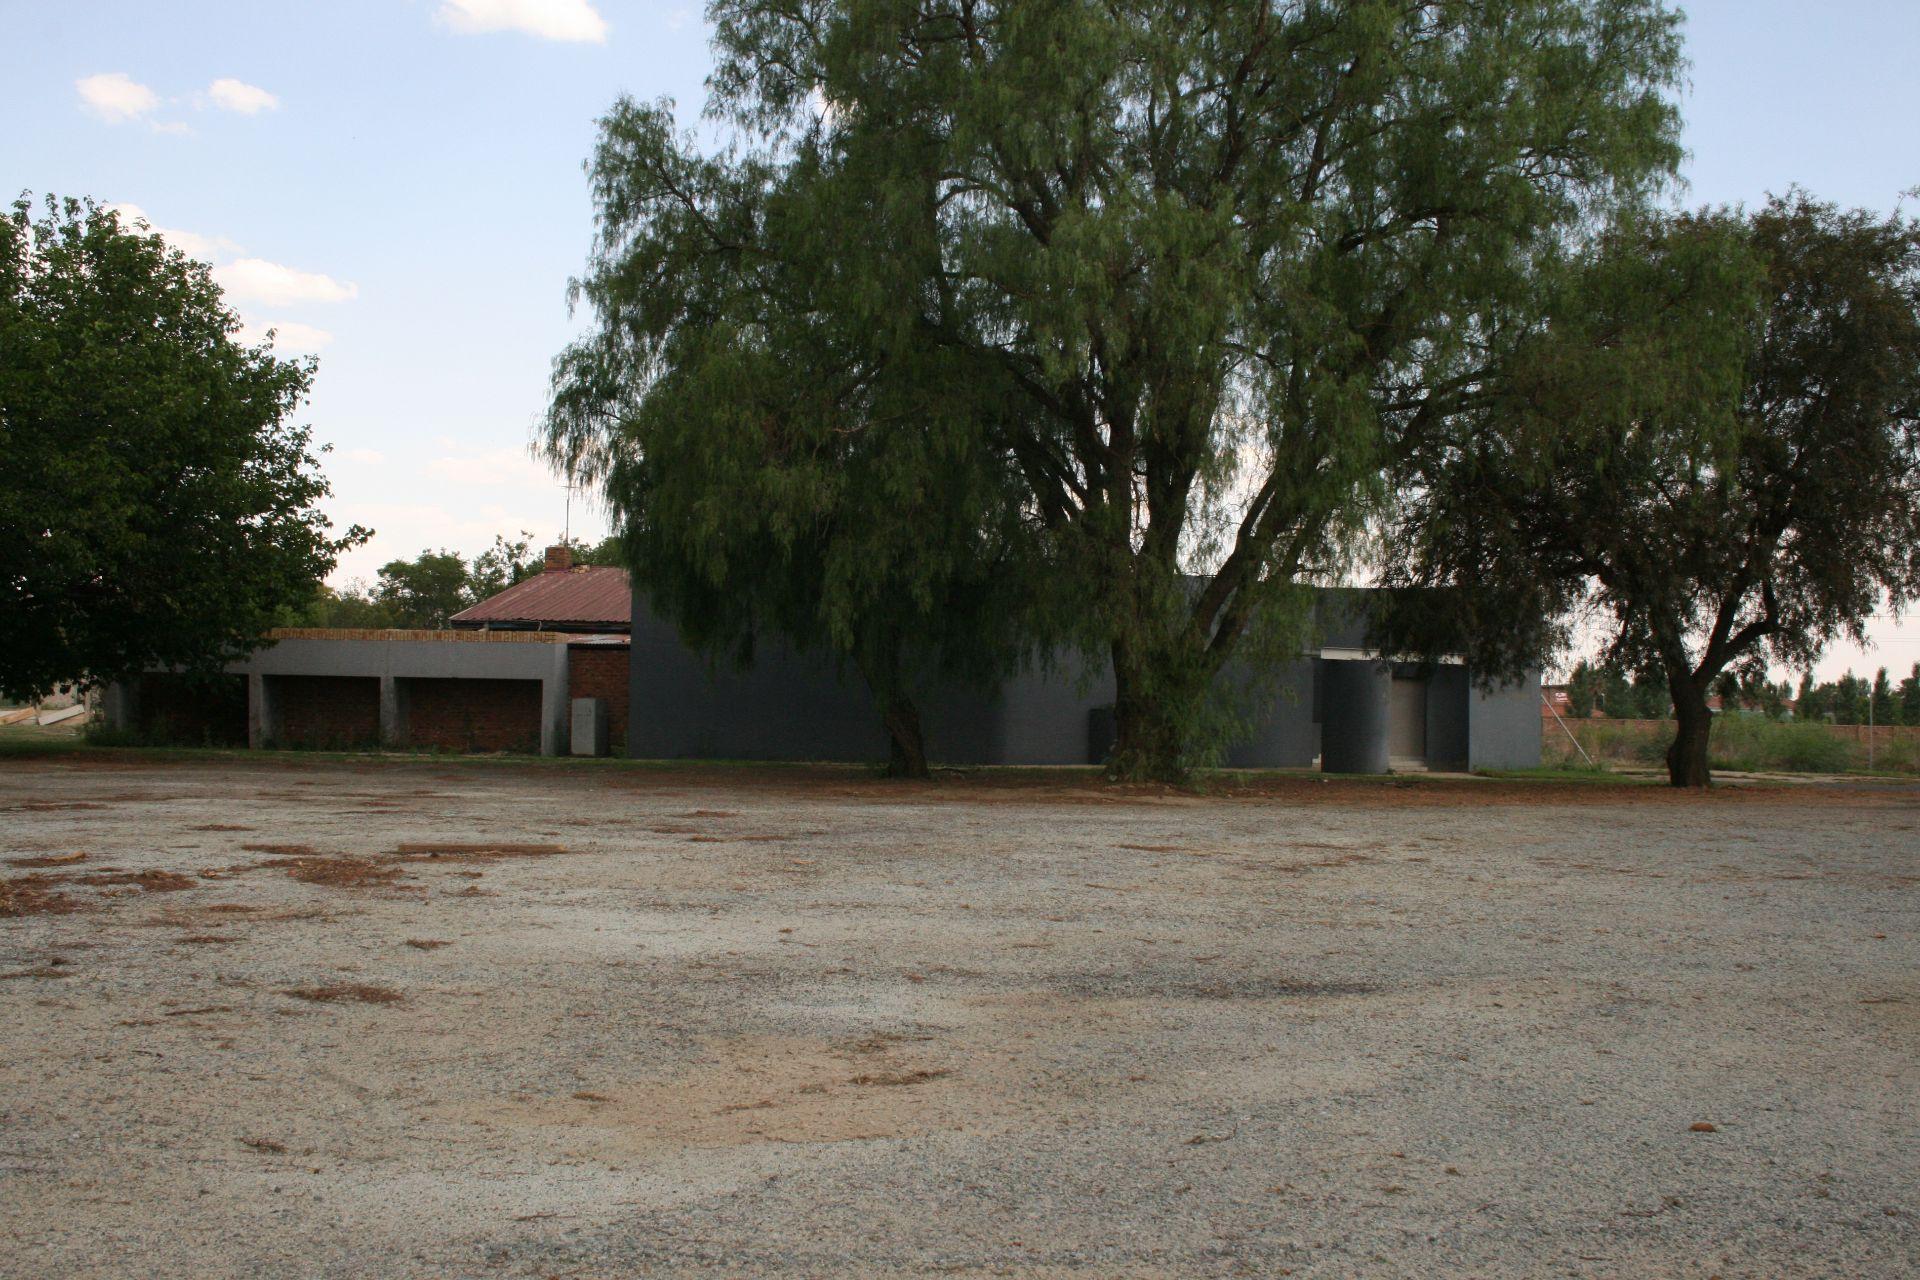 Potchefstroom, Vyfhoek Property  | Houses For Sale Vyfhoek, VYFHOEK, Farms  property for sale Price:5,300,000